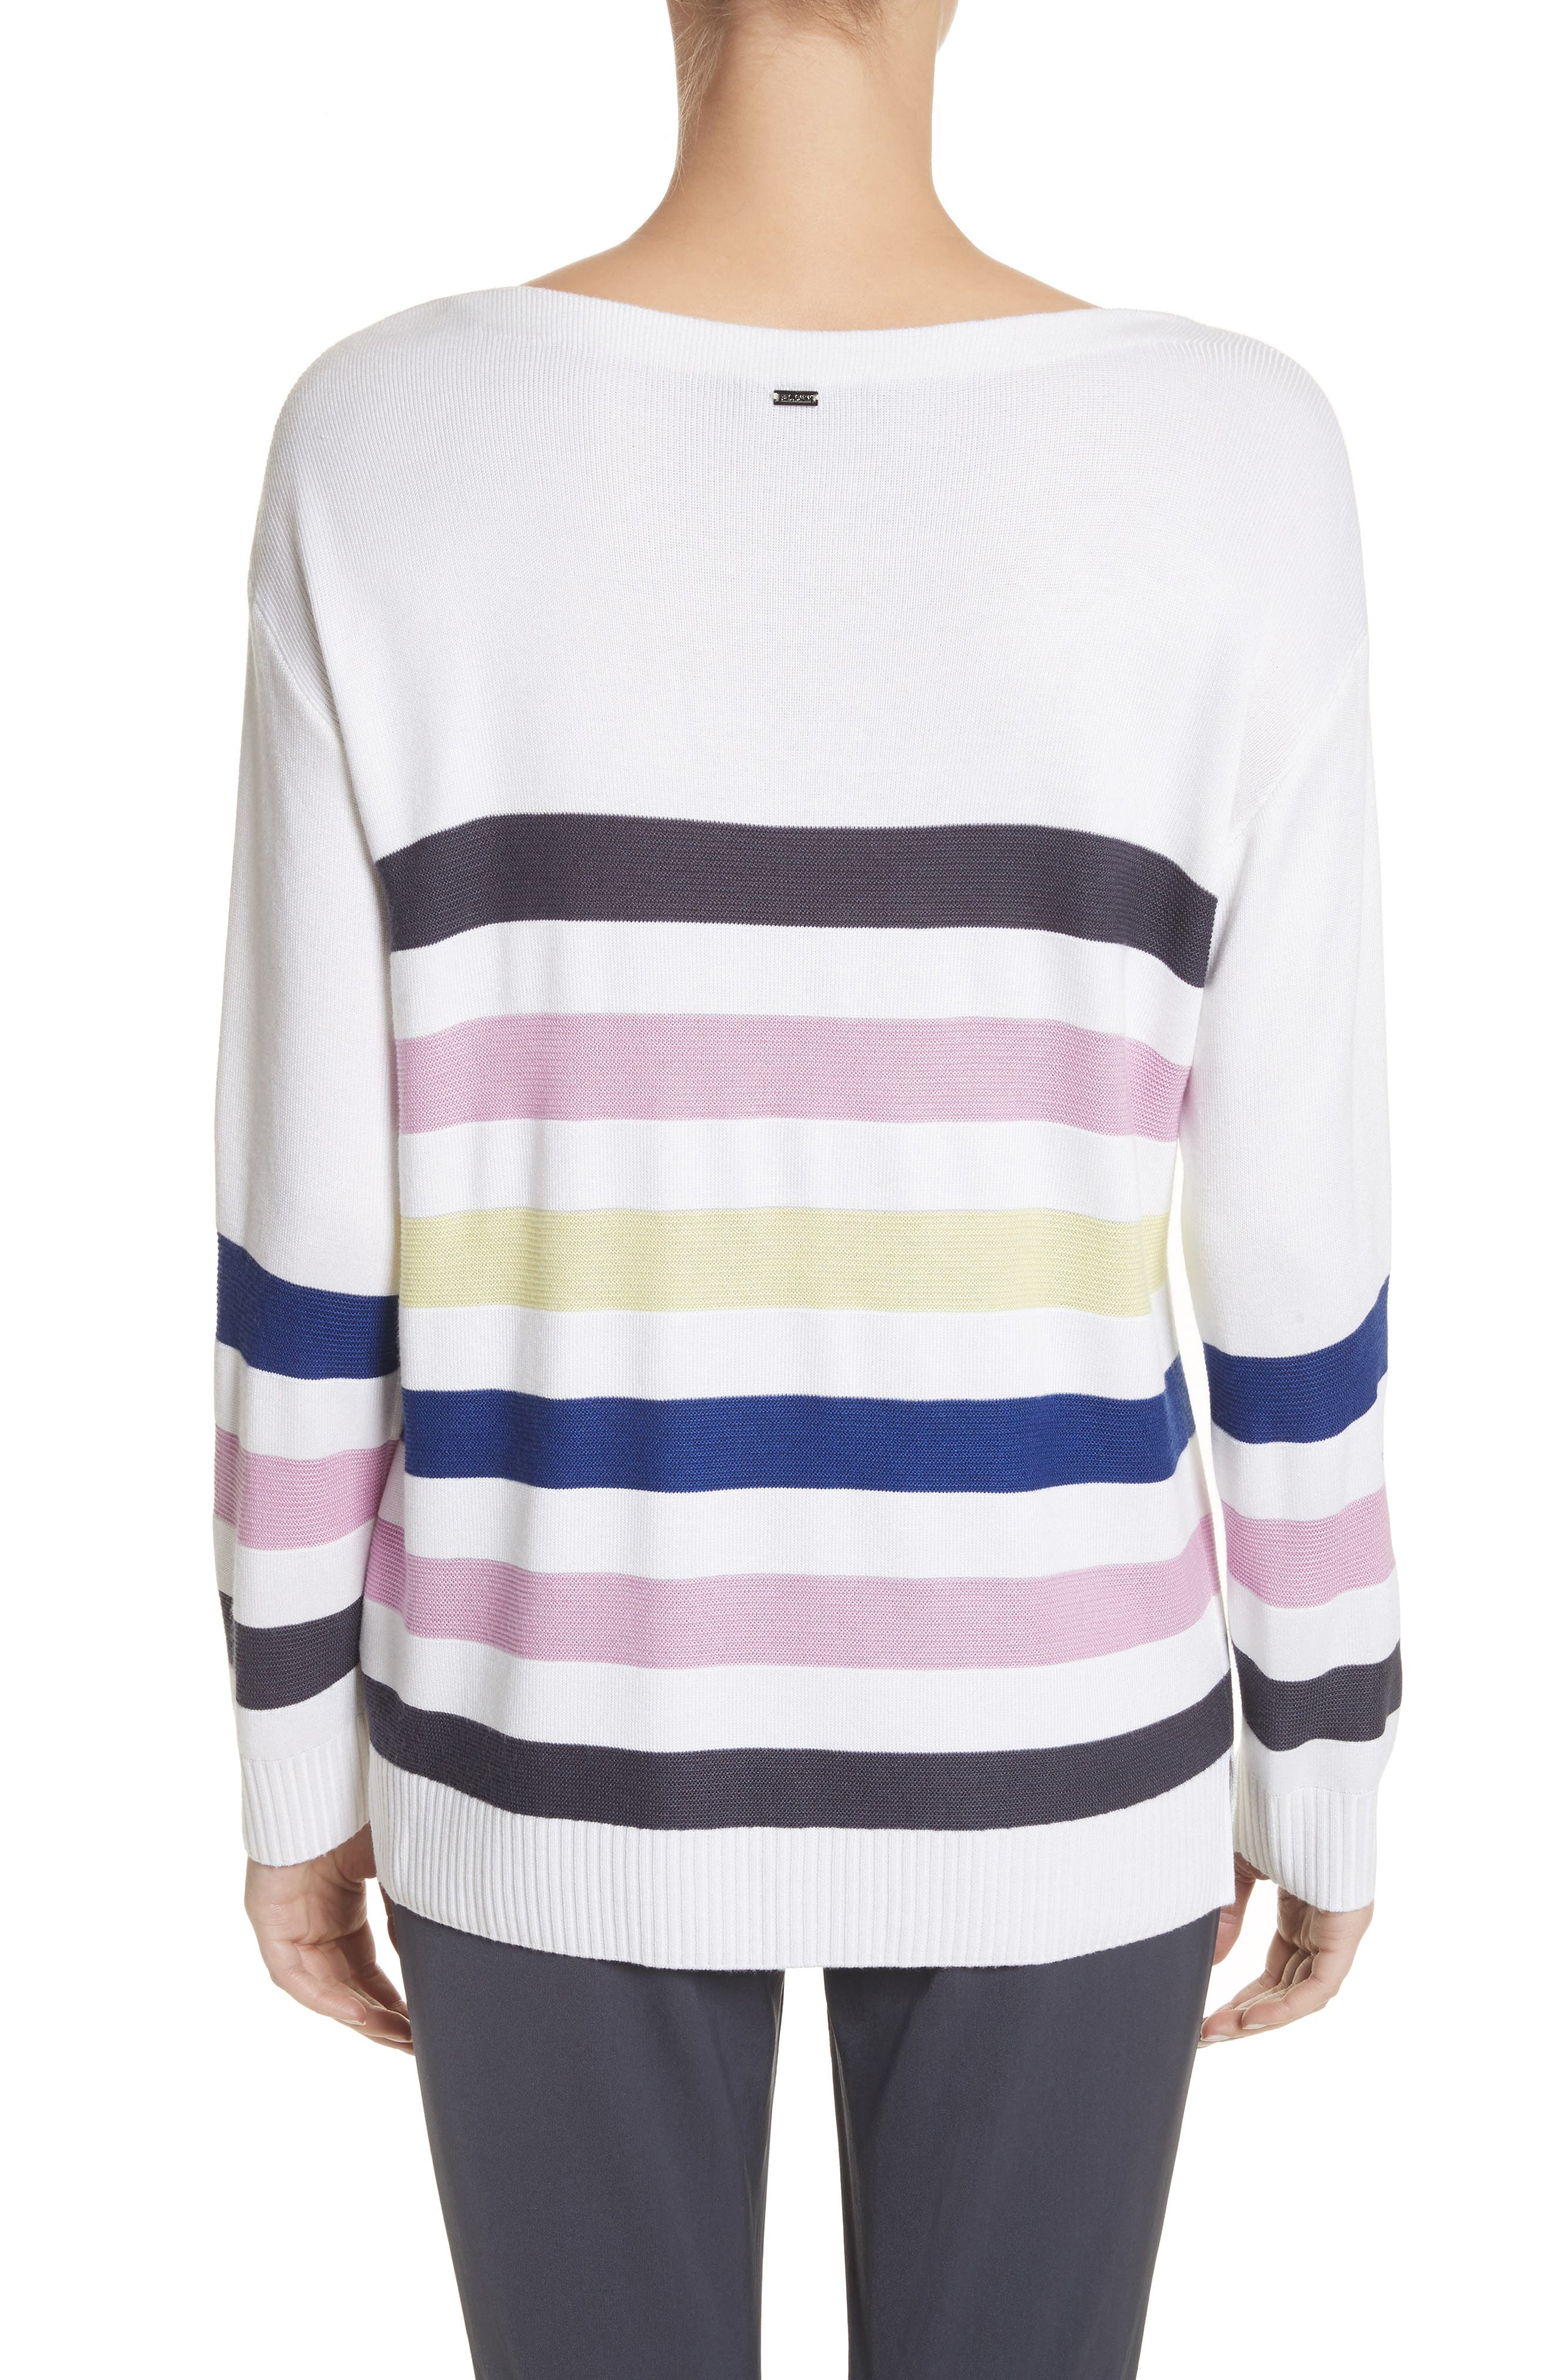 Links Stripe Knit Sweater,                             Alternate thumbnail 2, color,                             100